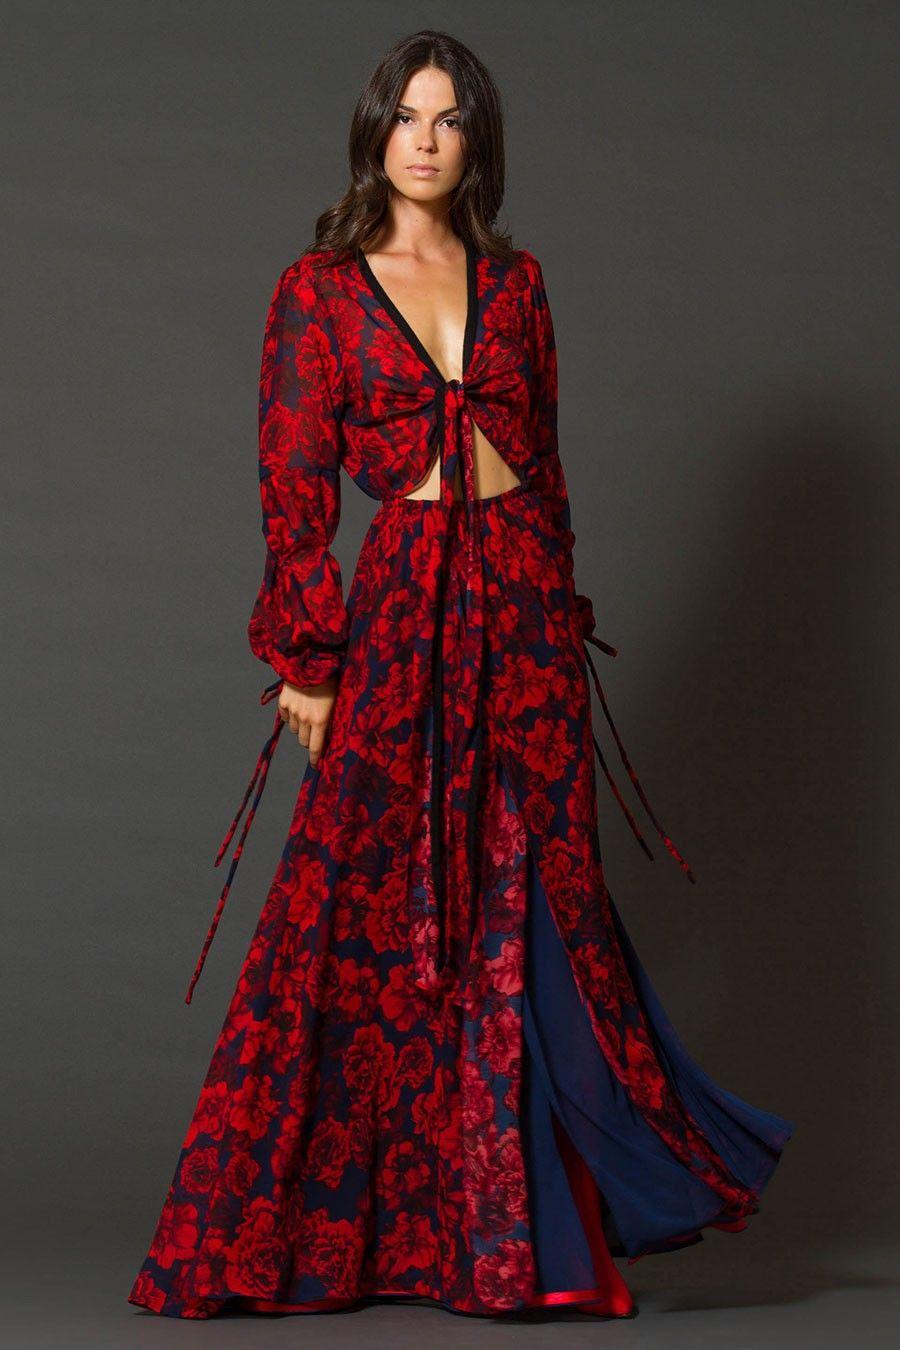 ad54198582f6 Εμπριμέ Φόρεμα Κρουαζέ Σιφόν όλο διπλό. Κοκτέιλ Φόρεμα για κάθε περίσταση.  Κρουαζέ στο στήθος